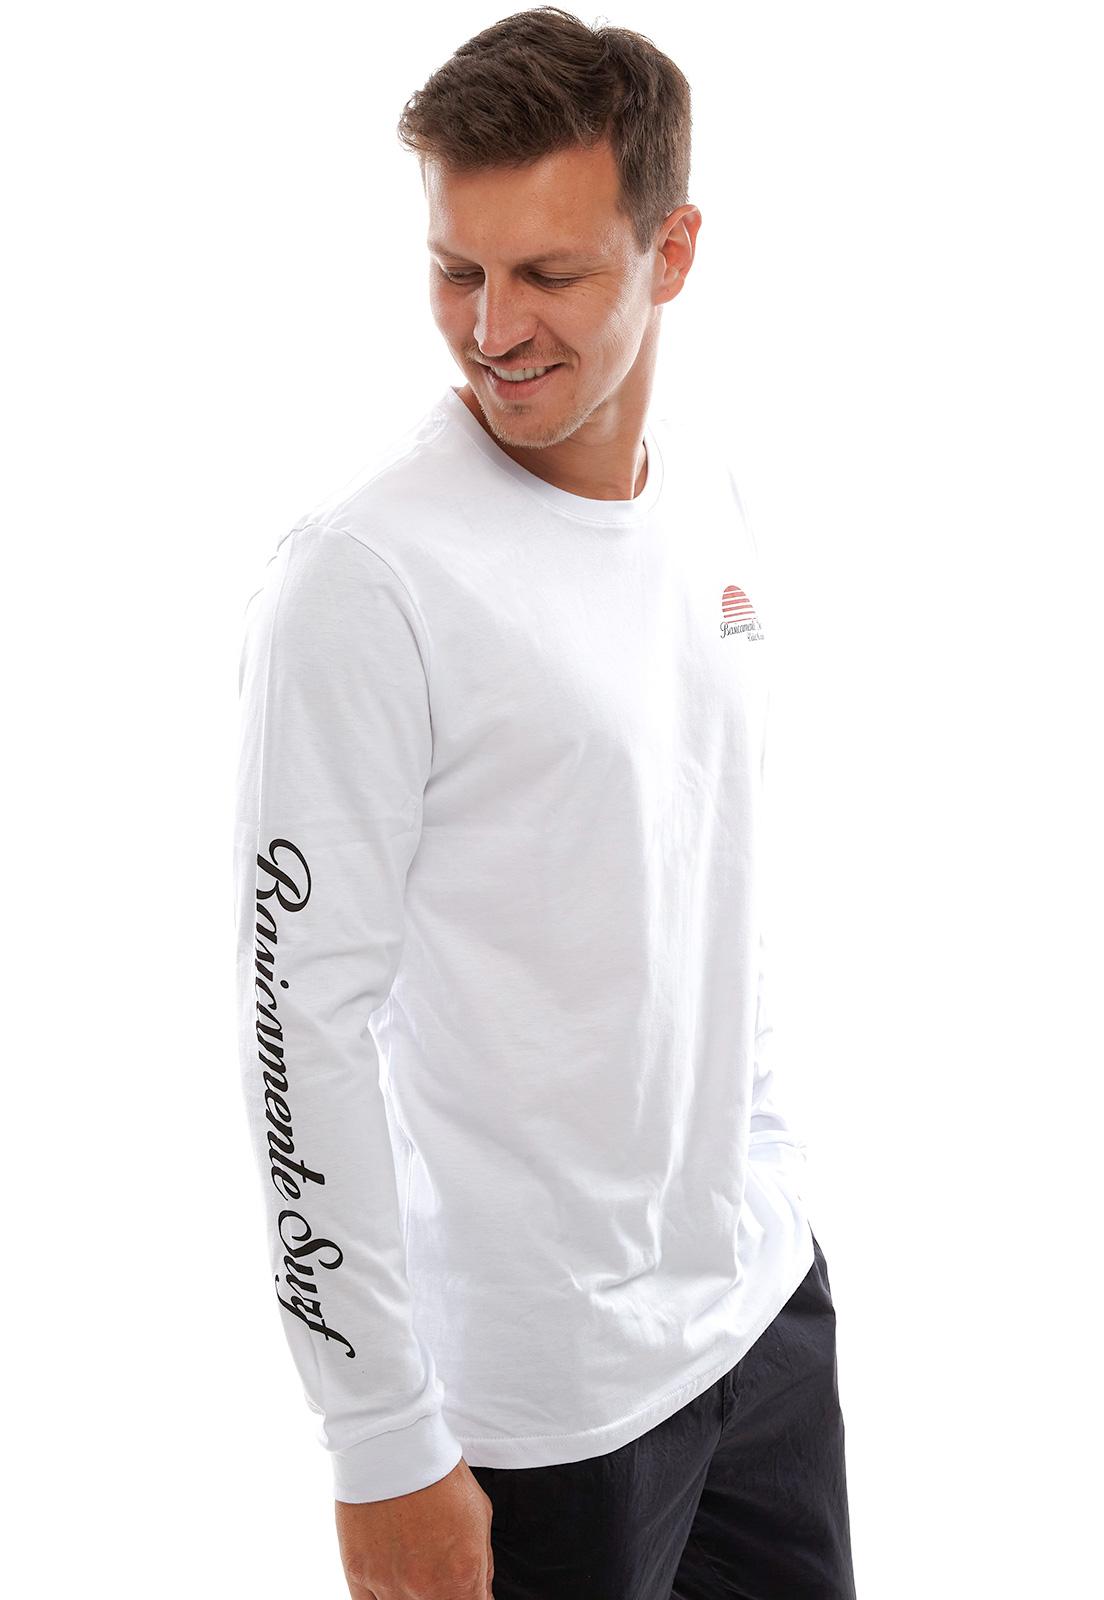 Camiseta Vida Marinha Manga Longa Branca